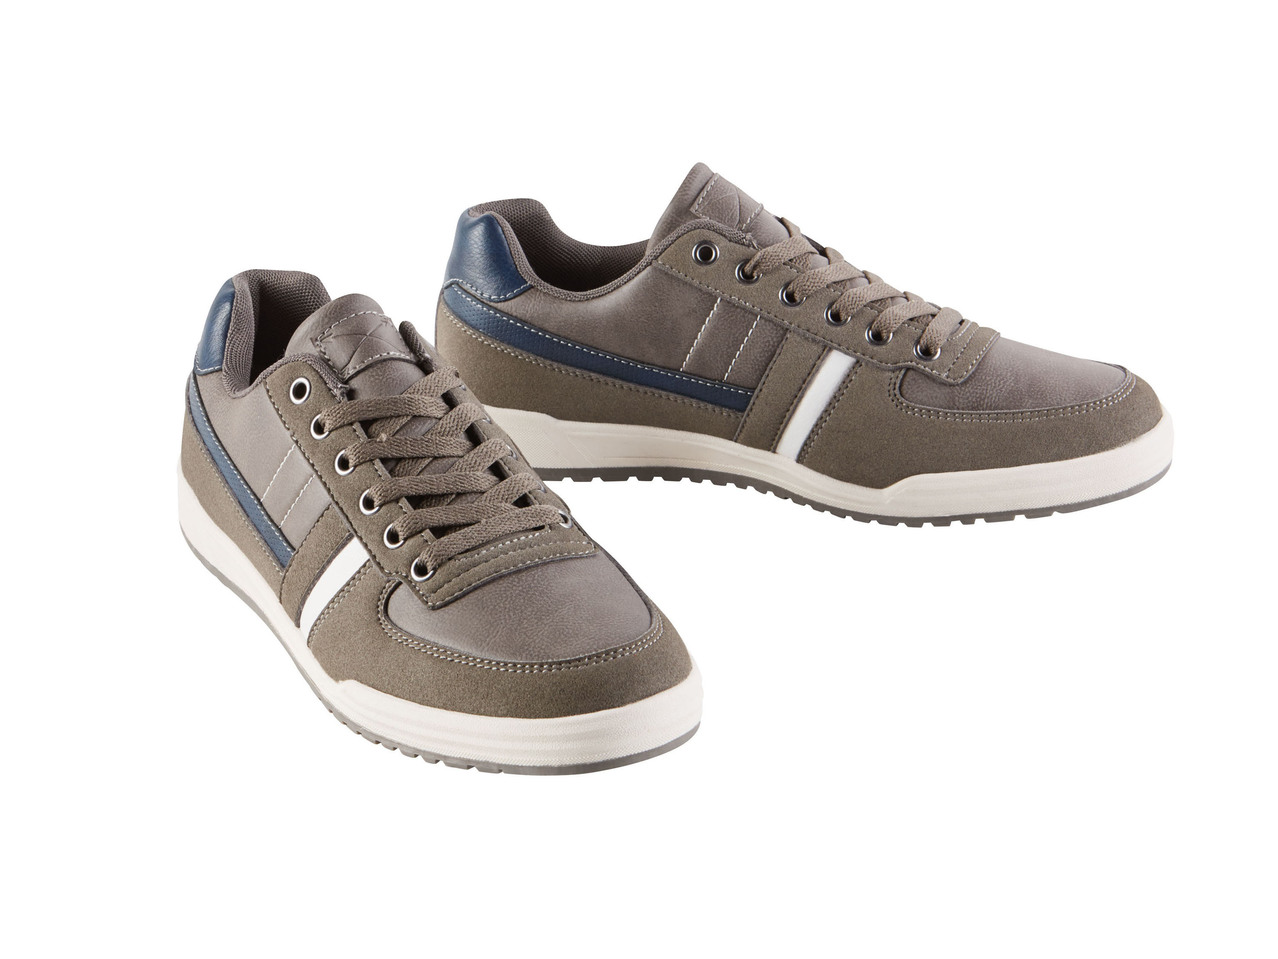 Promozionali Italia Uomo Sneaker Offerte Lidl Da Archivio — Ig67vfYby